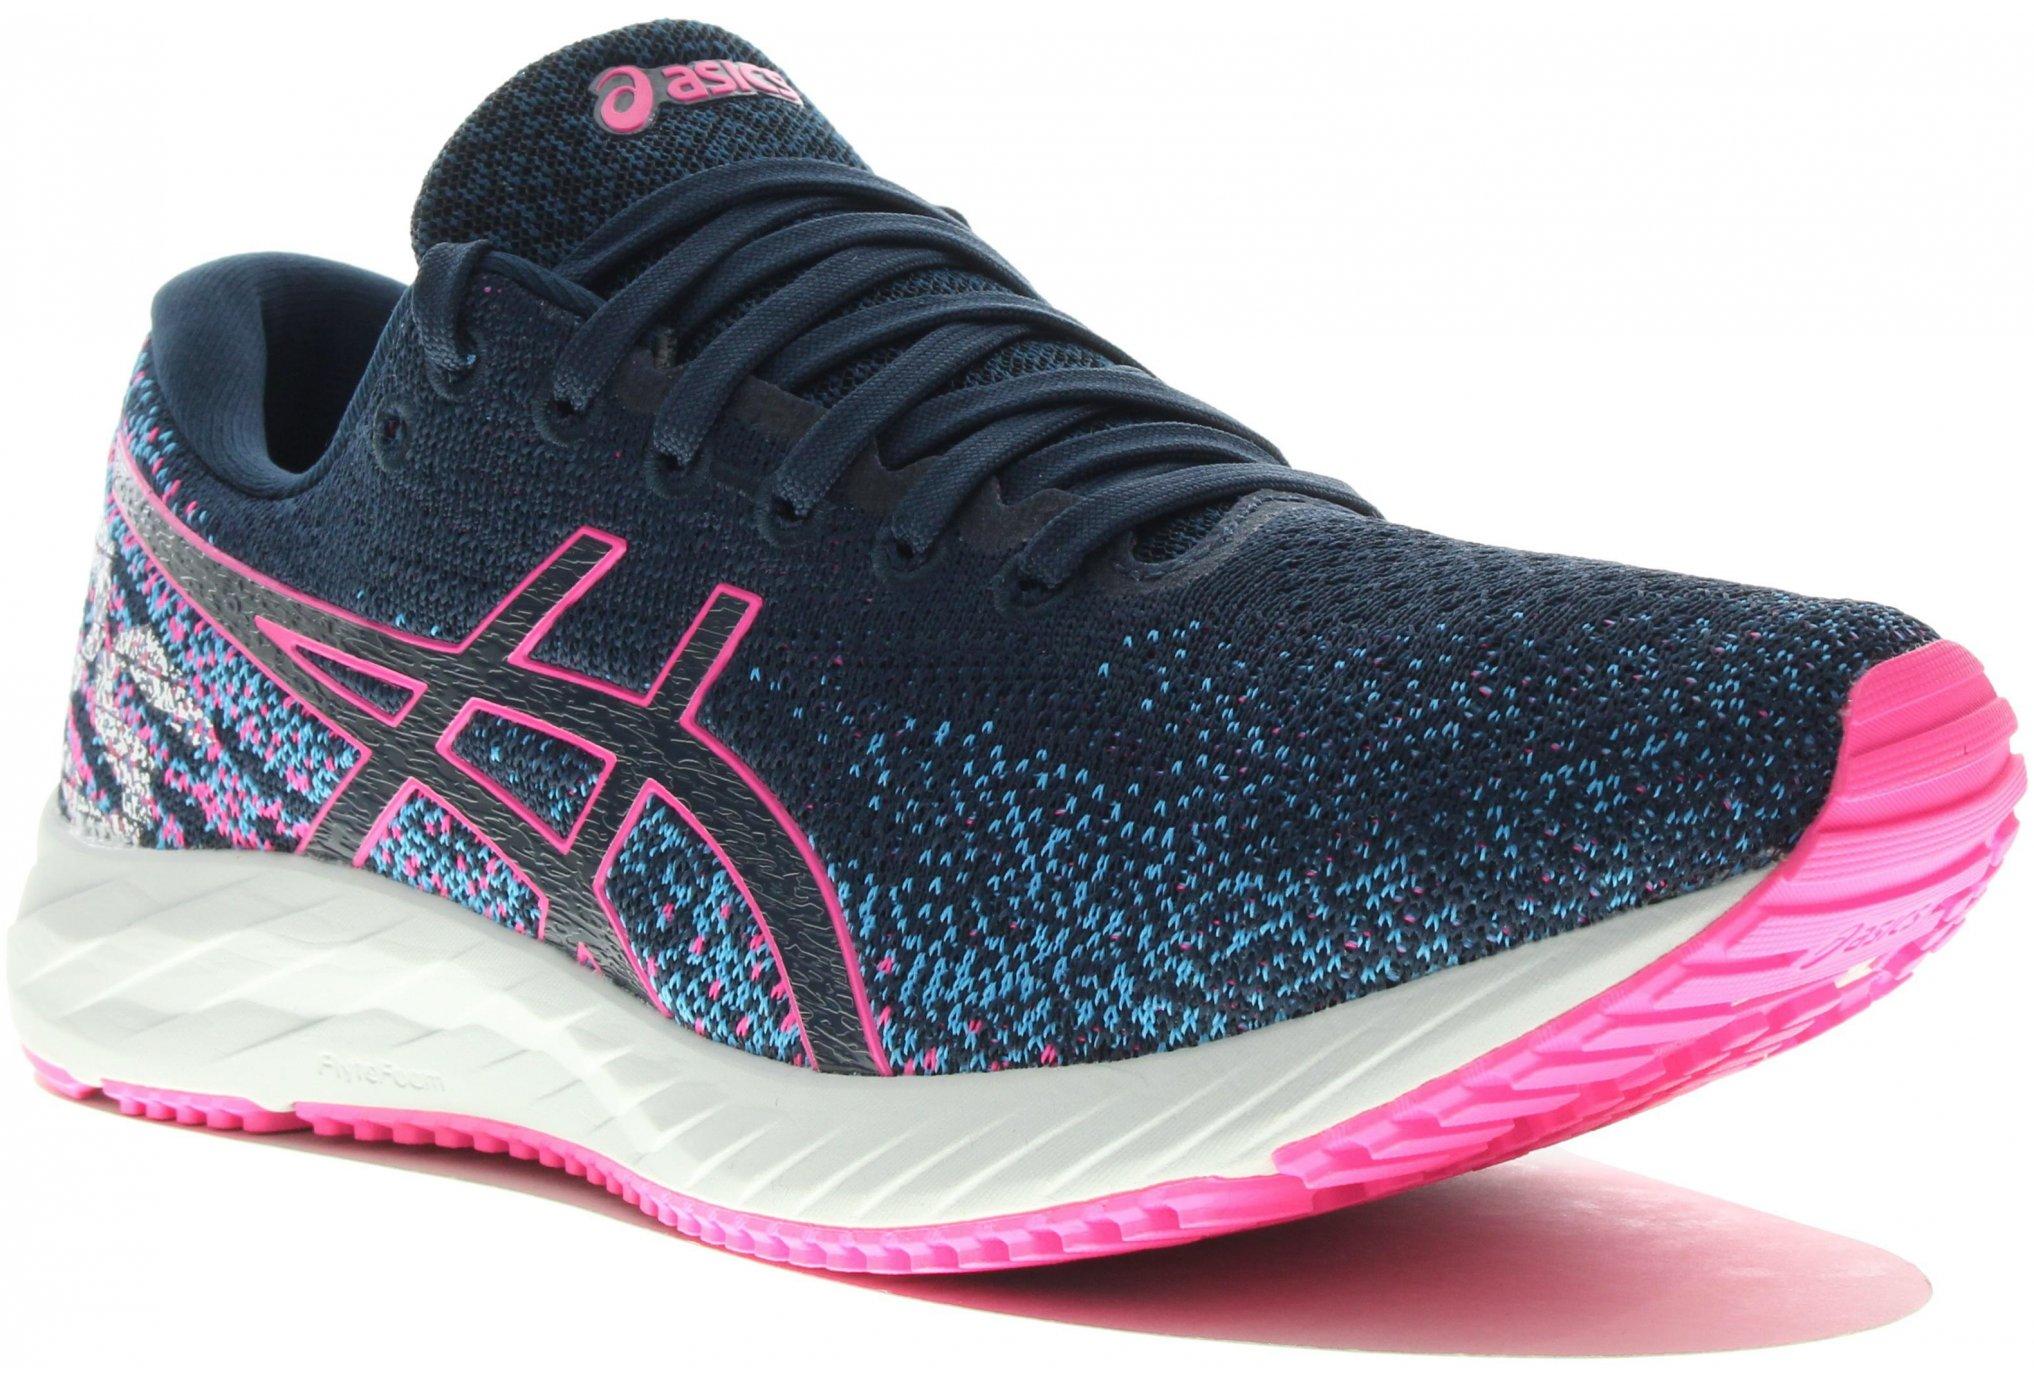 Asics Gel-DS Trainer 26 Chaussures running femme